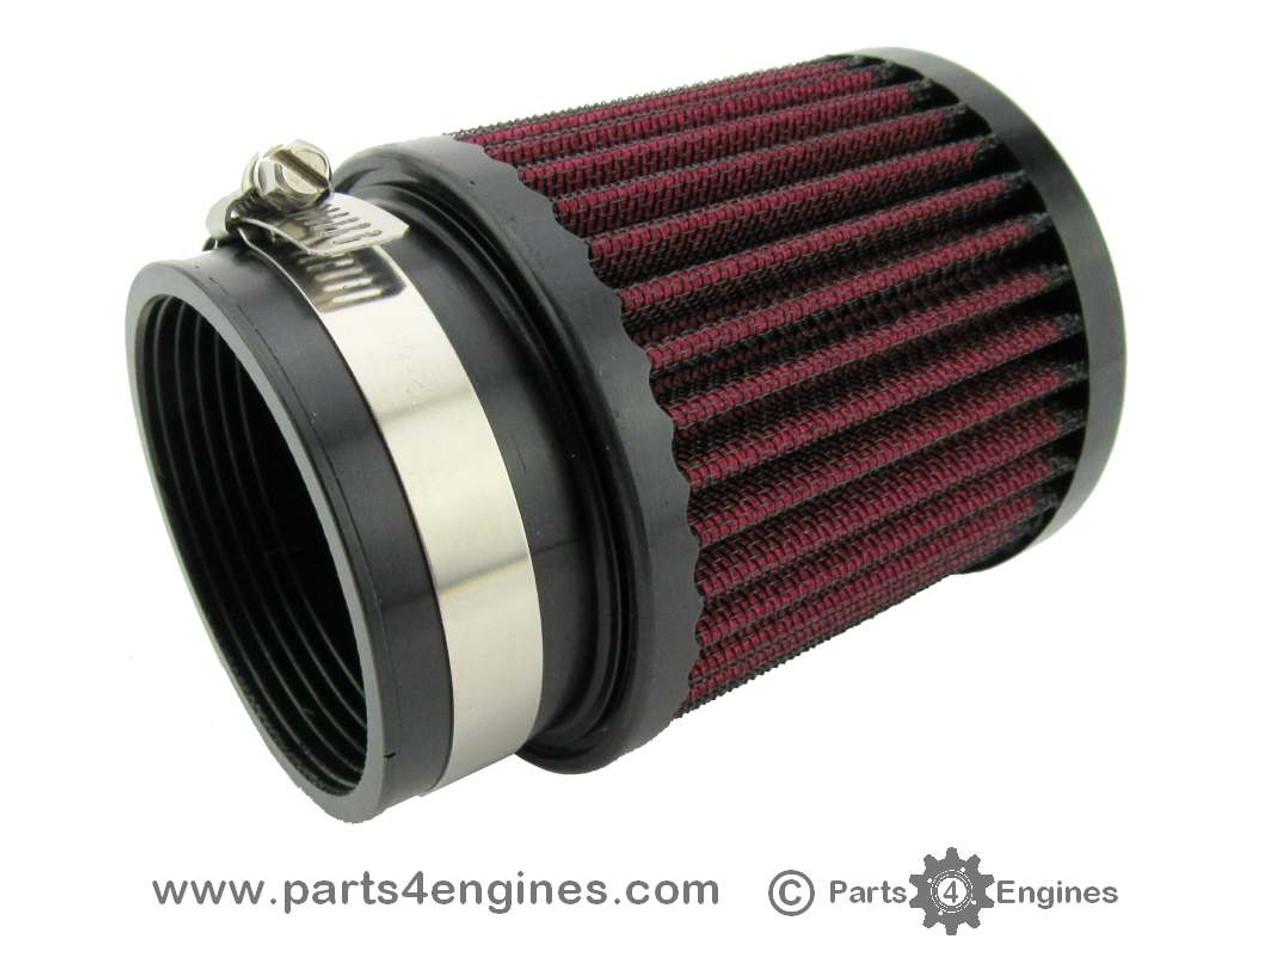 Volvo Penta D2-55 Air filter - parts4engines.com